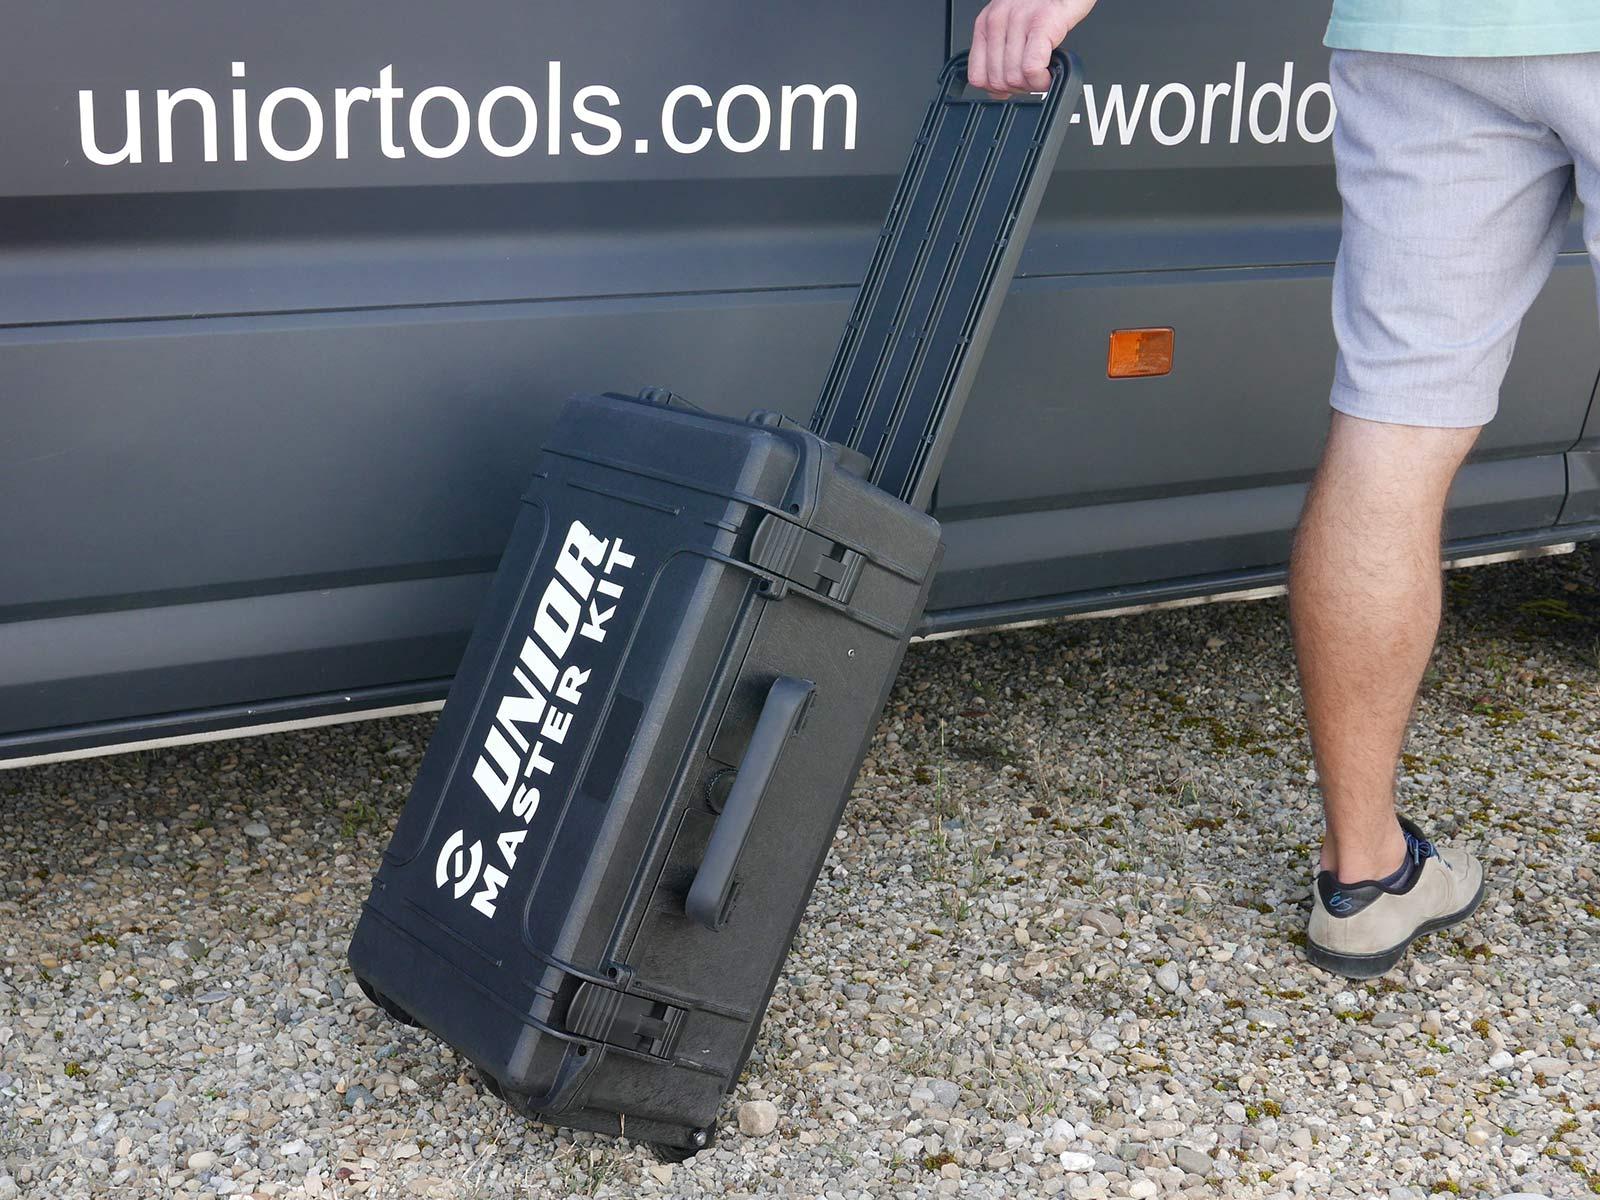 Unior Master Kit professional bike mechanic travel toolbox made in Europe, rolling